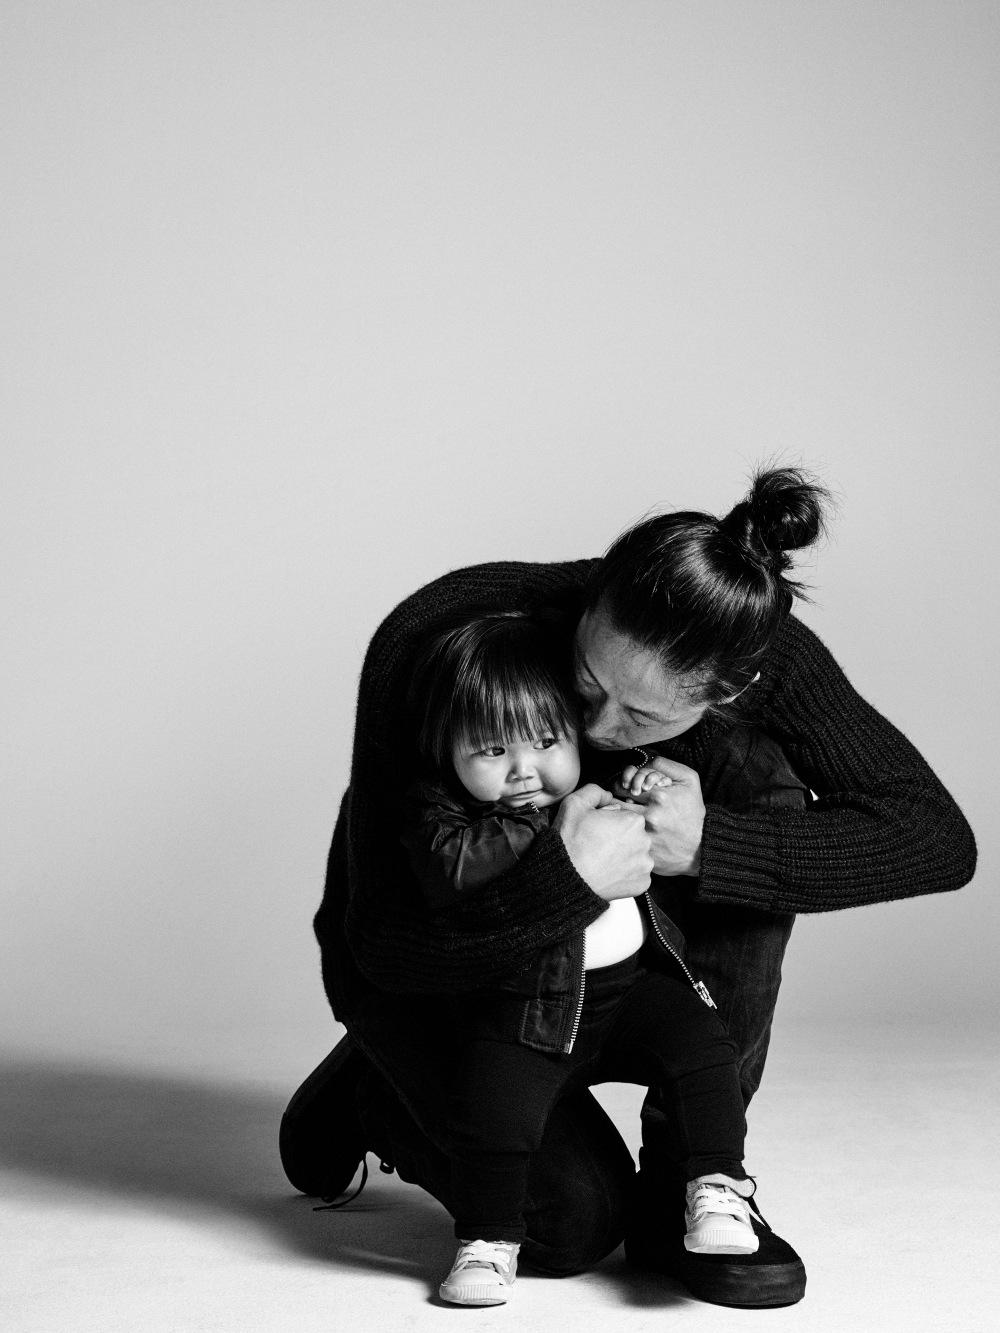 Bent Lee - Closed Sales Agent from Copenhagen - with his daughter